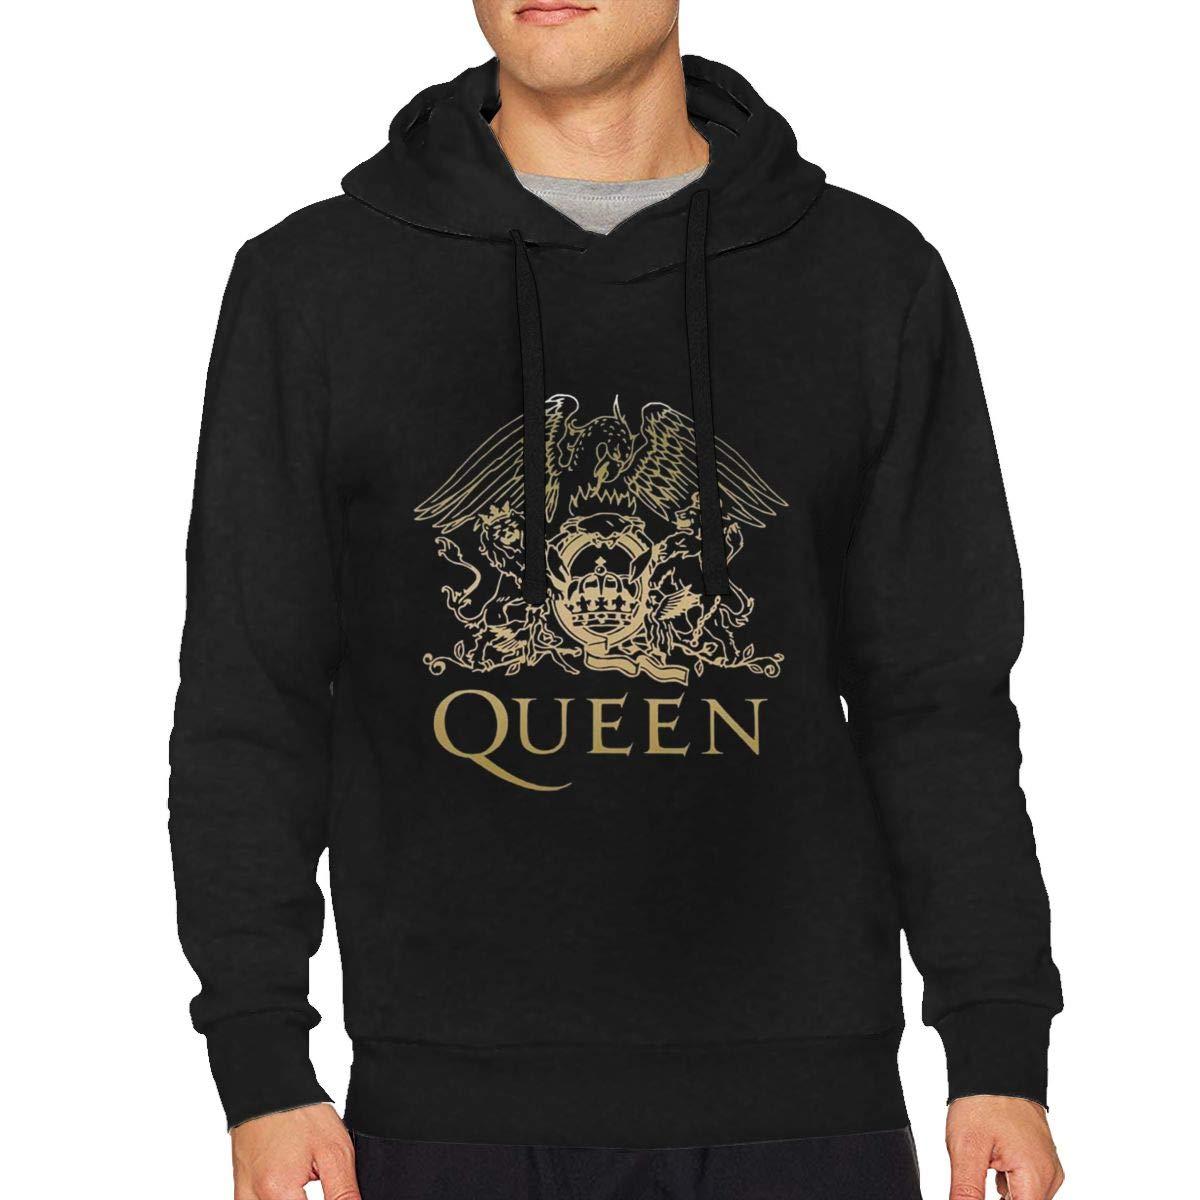 Xzksqrsweq S Queen R Nnice R Ns 5938 Shirts